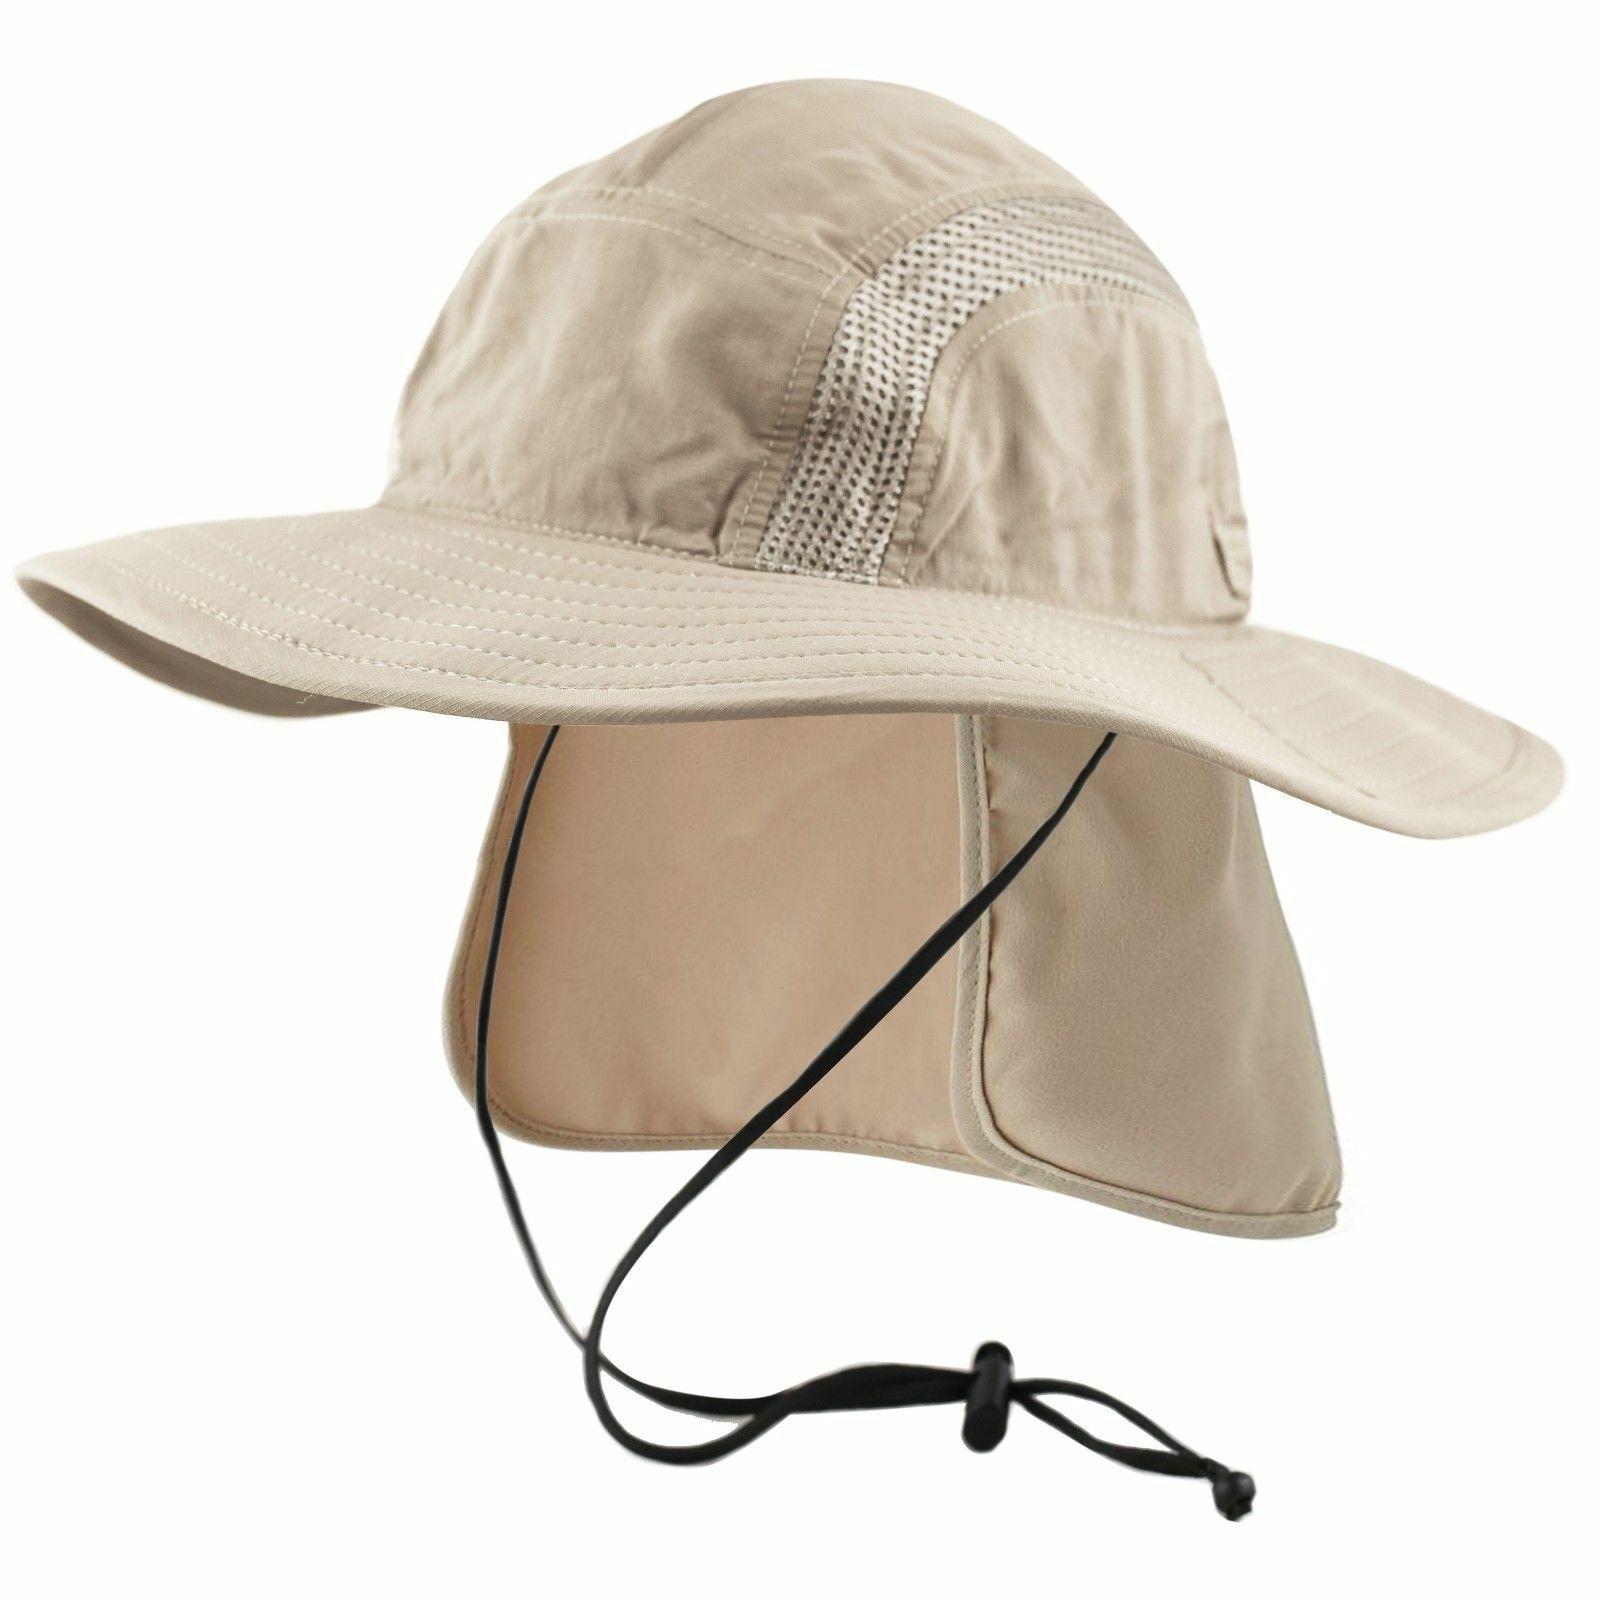 76de19b10 Safari Bucket Hat UPF-50 Sun Protection w/ Mesh Crown Crushable Neck ...